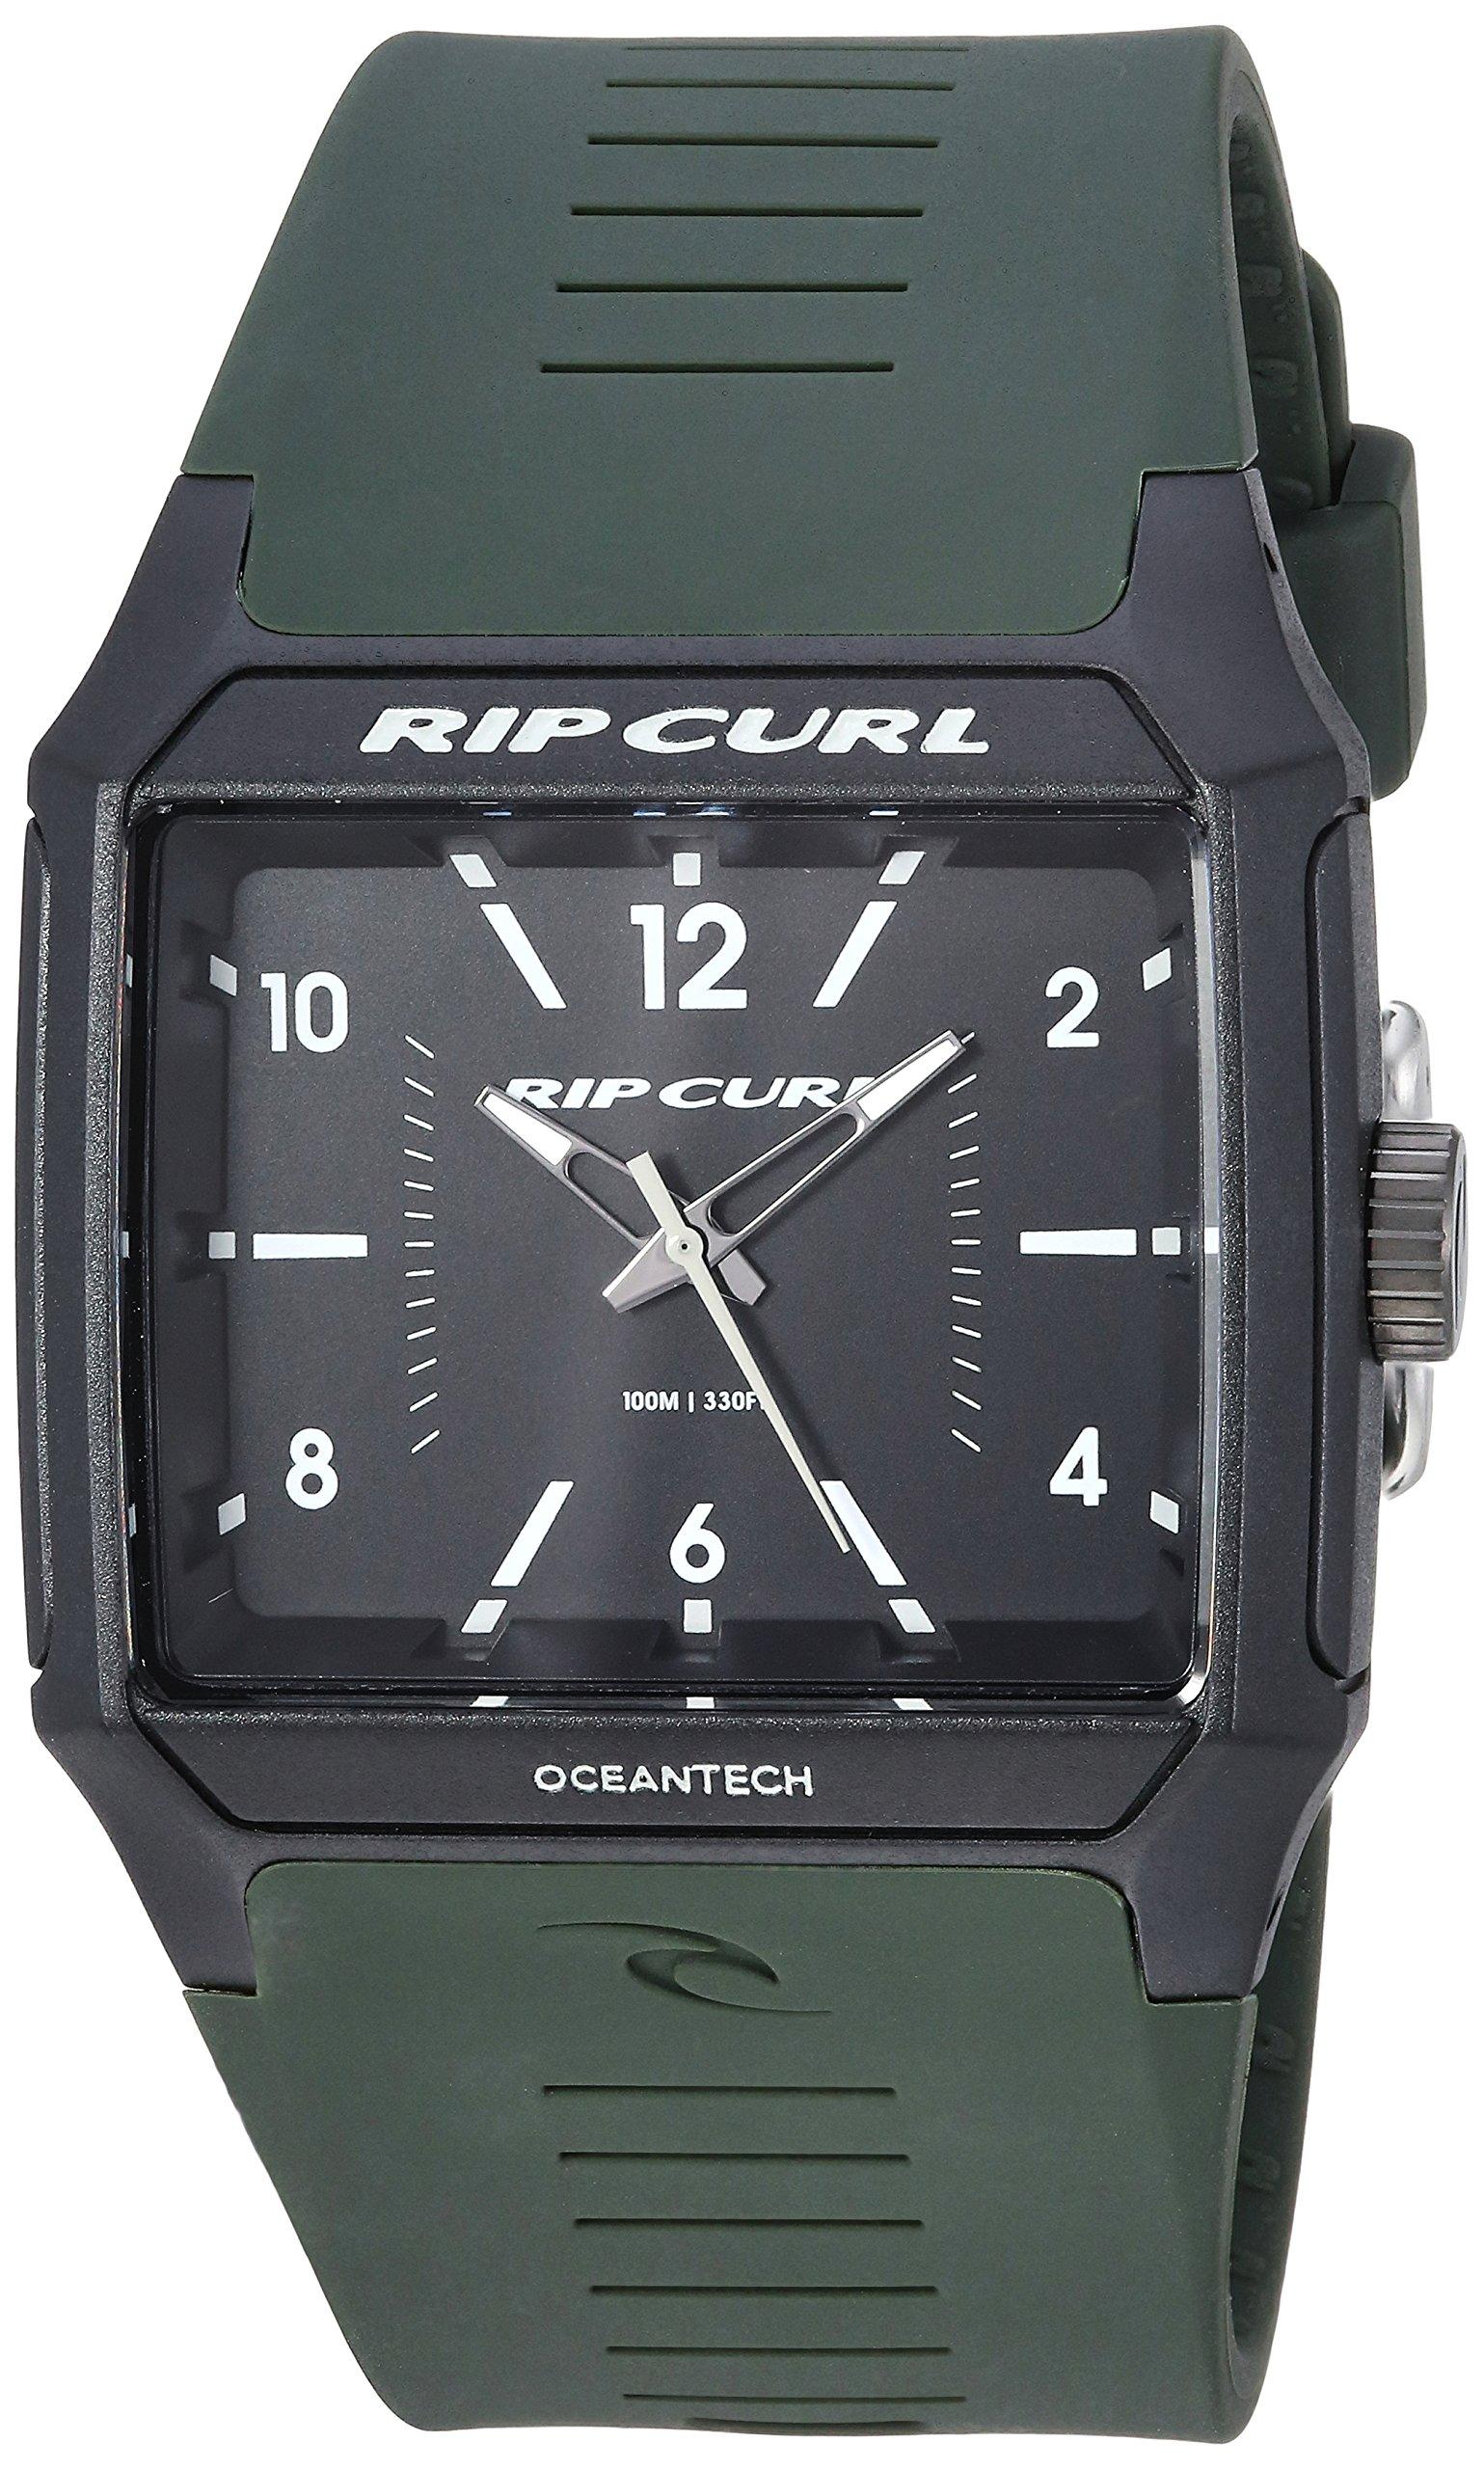 Rip Curl Men's Rifles Quartz Sport Watch with Polyurethane Strap, Green, 23 (Model: A3038-MIL) by Rip Curl